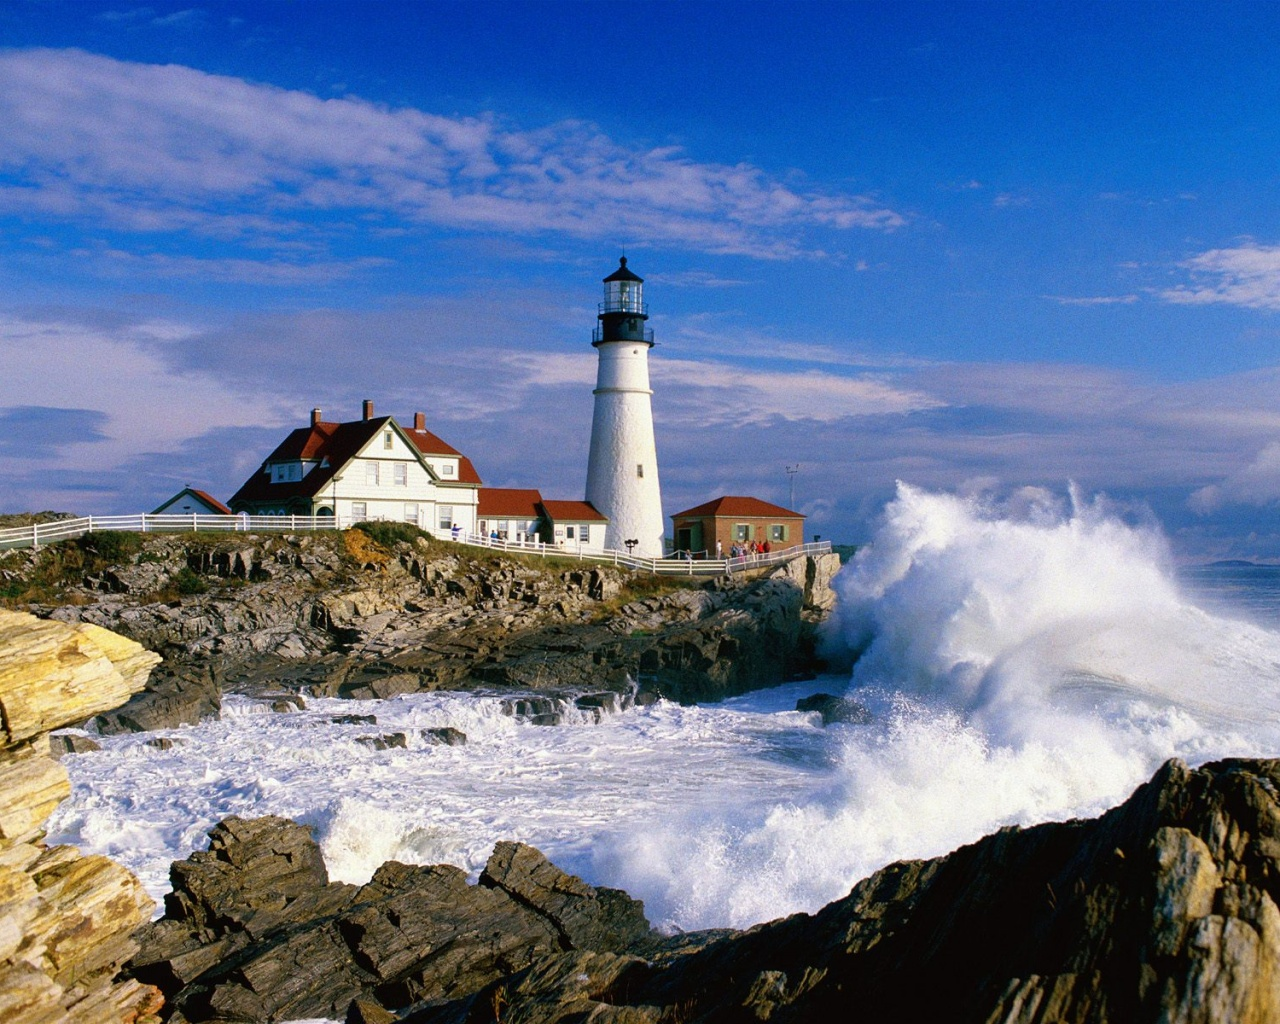 Portland Maine Headlight Lighthouse 1280x1024